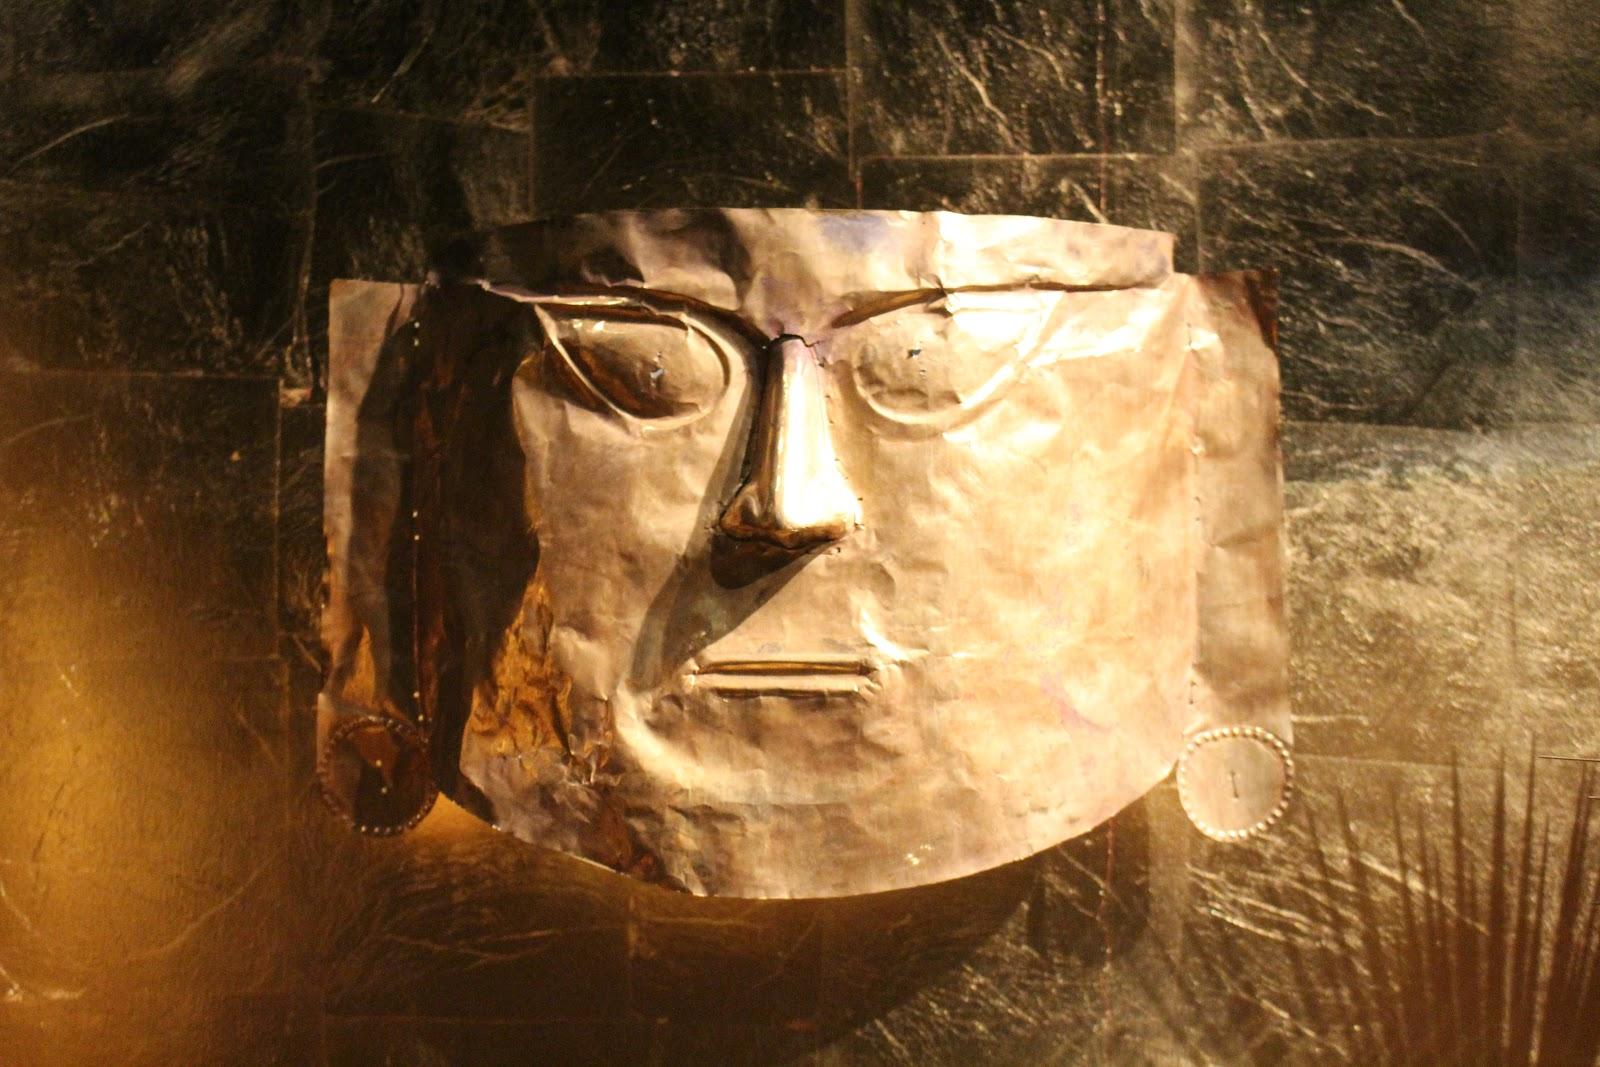 Dries Van Noten Inspirations MoMu Gold Inca mask